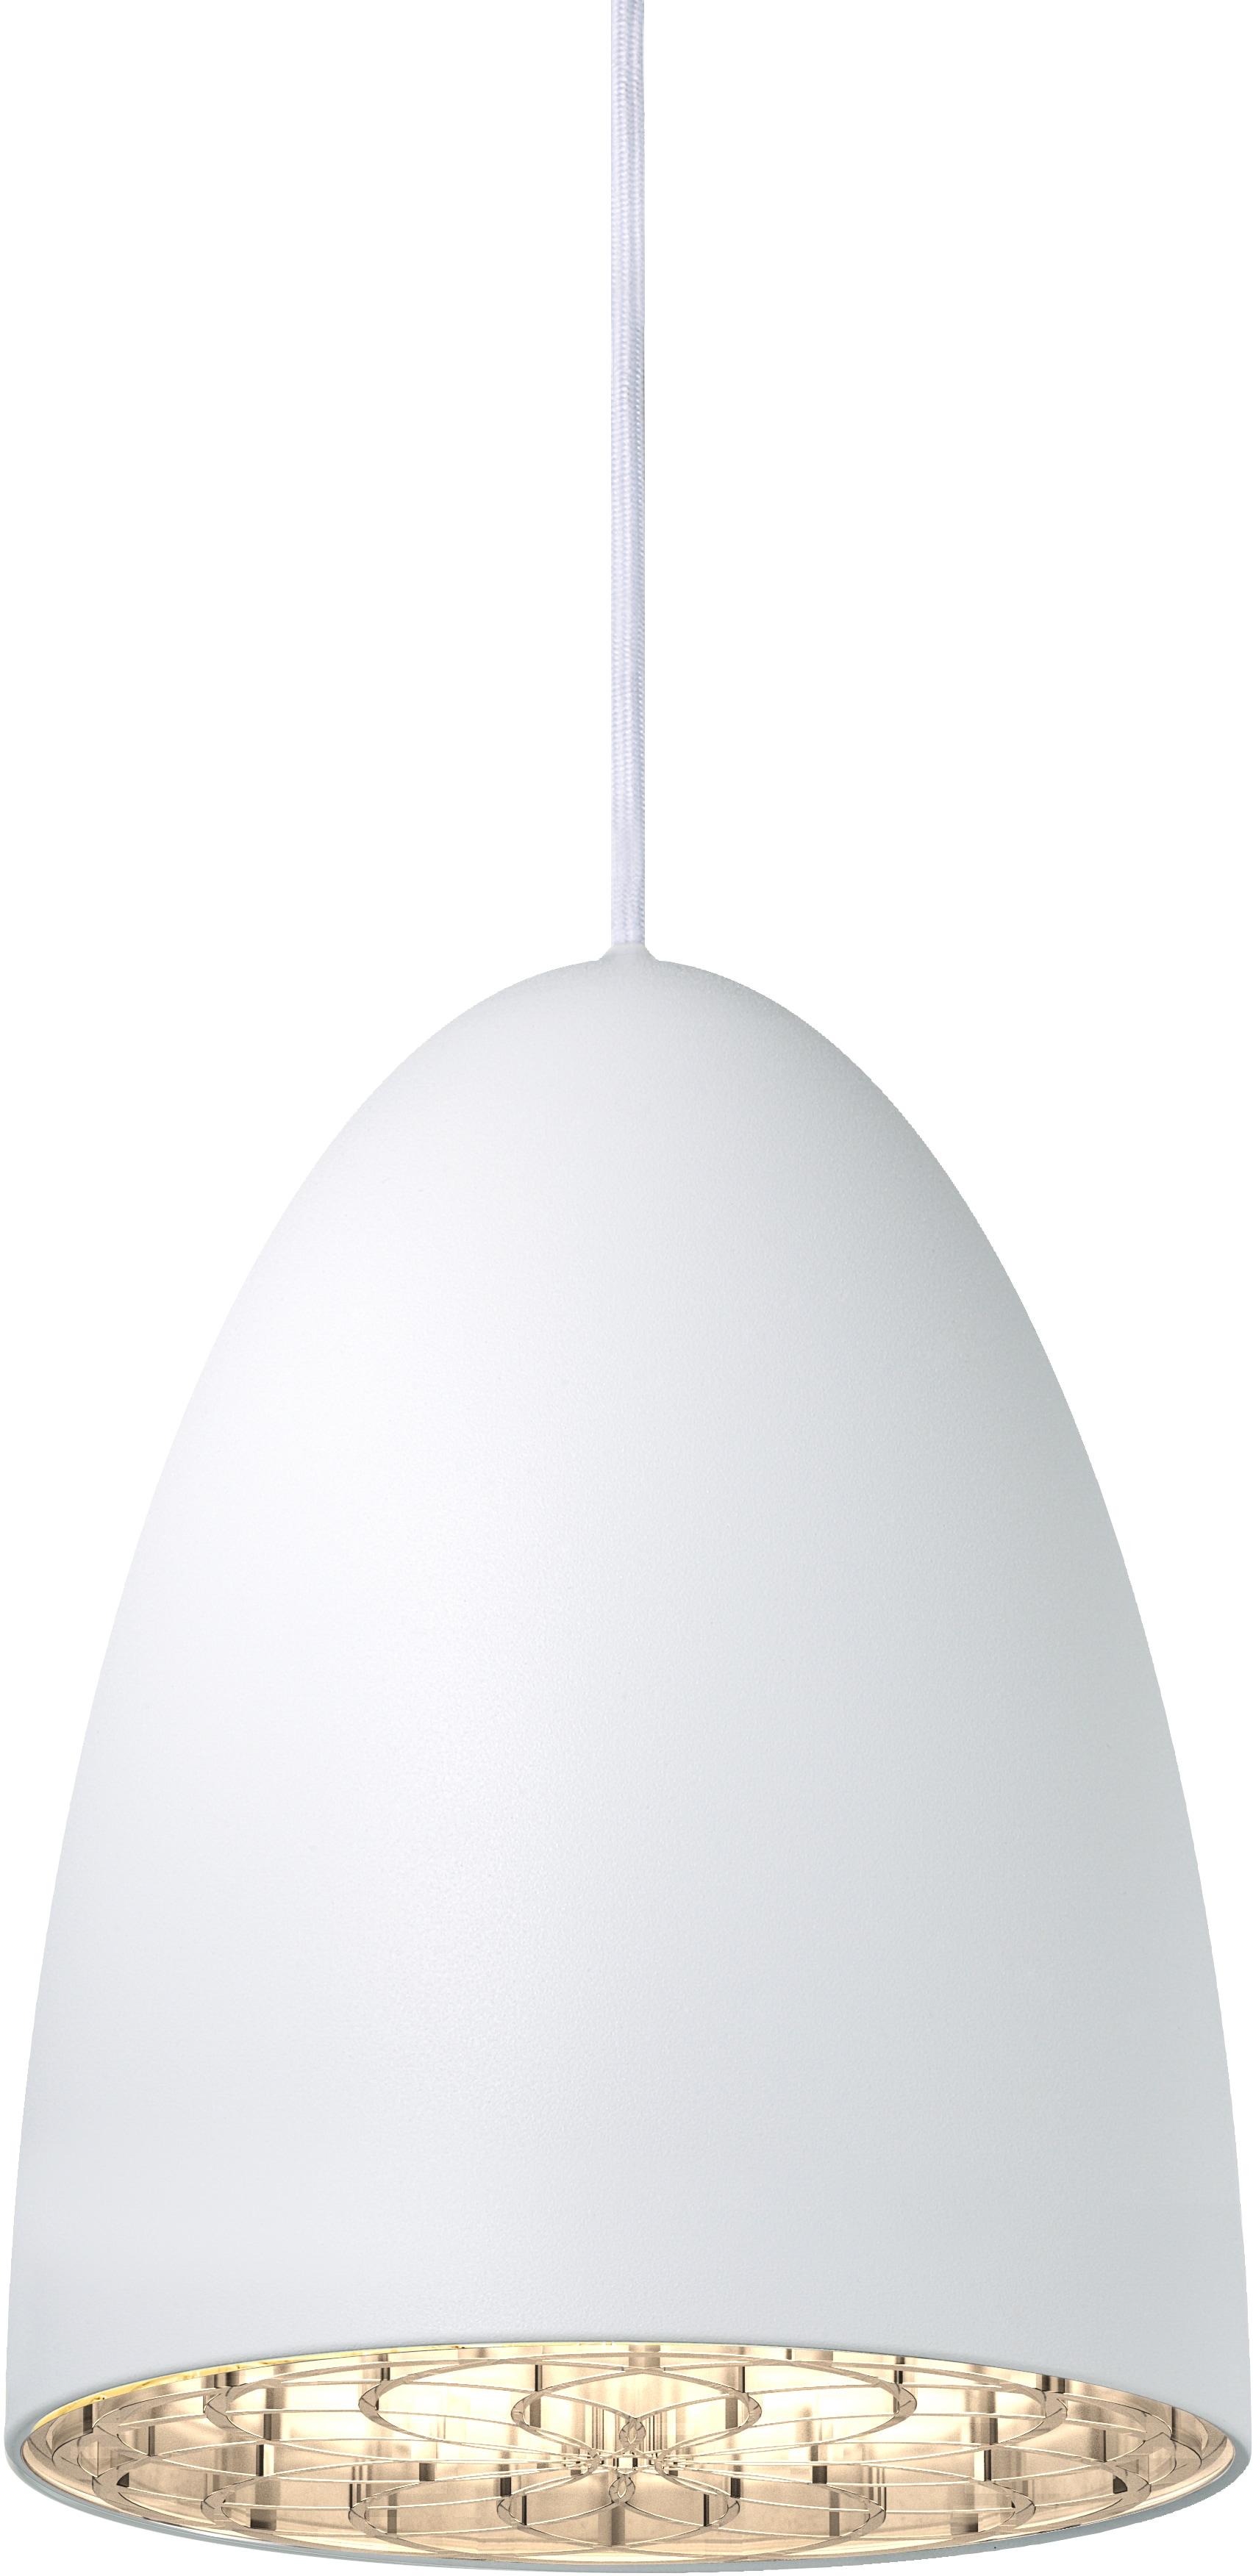 design for the people,Pendelleuchte Nexus 20